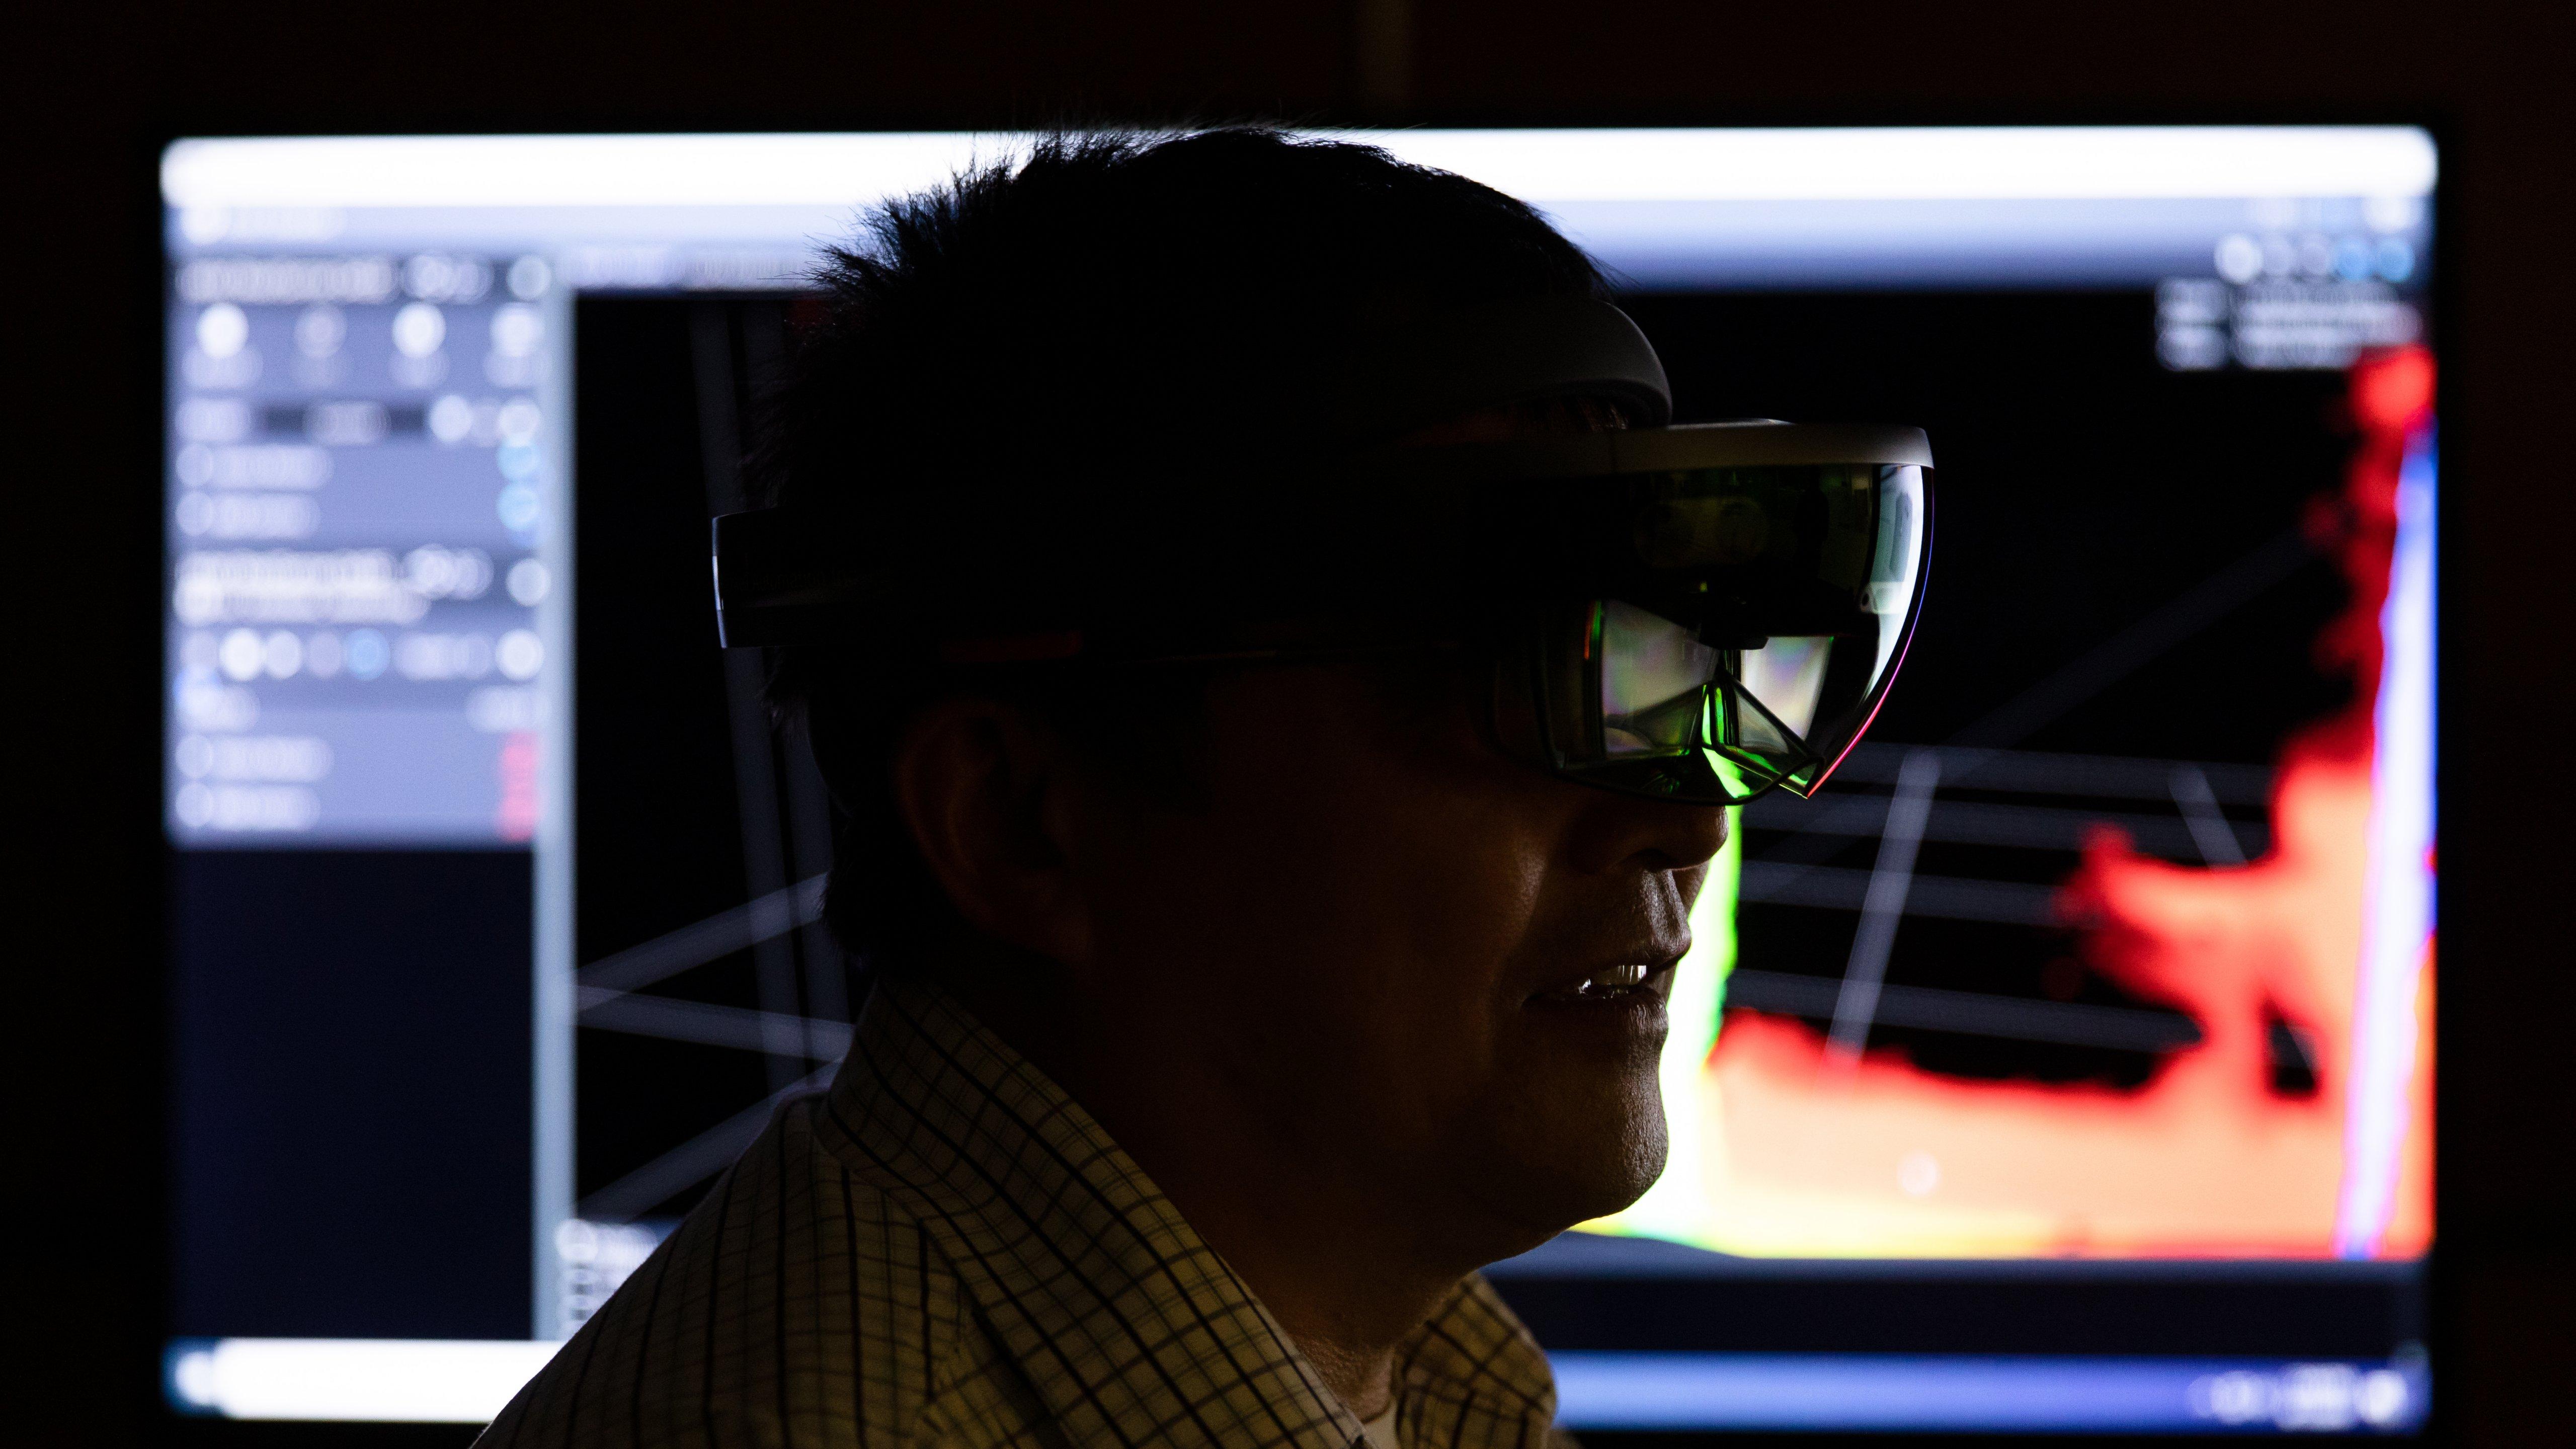 Digital 3D Models in industry environment